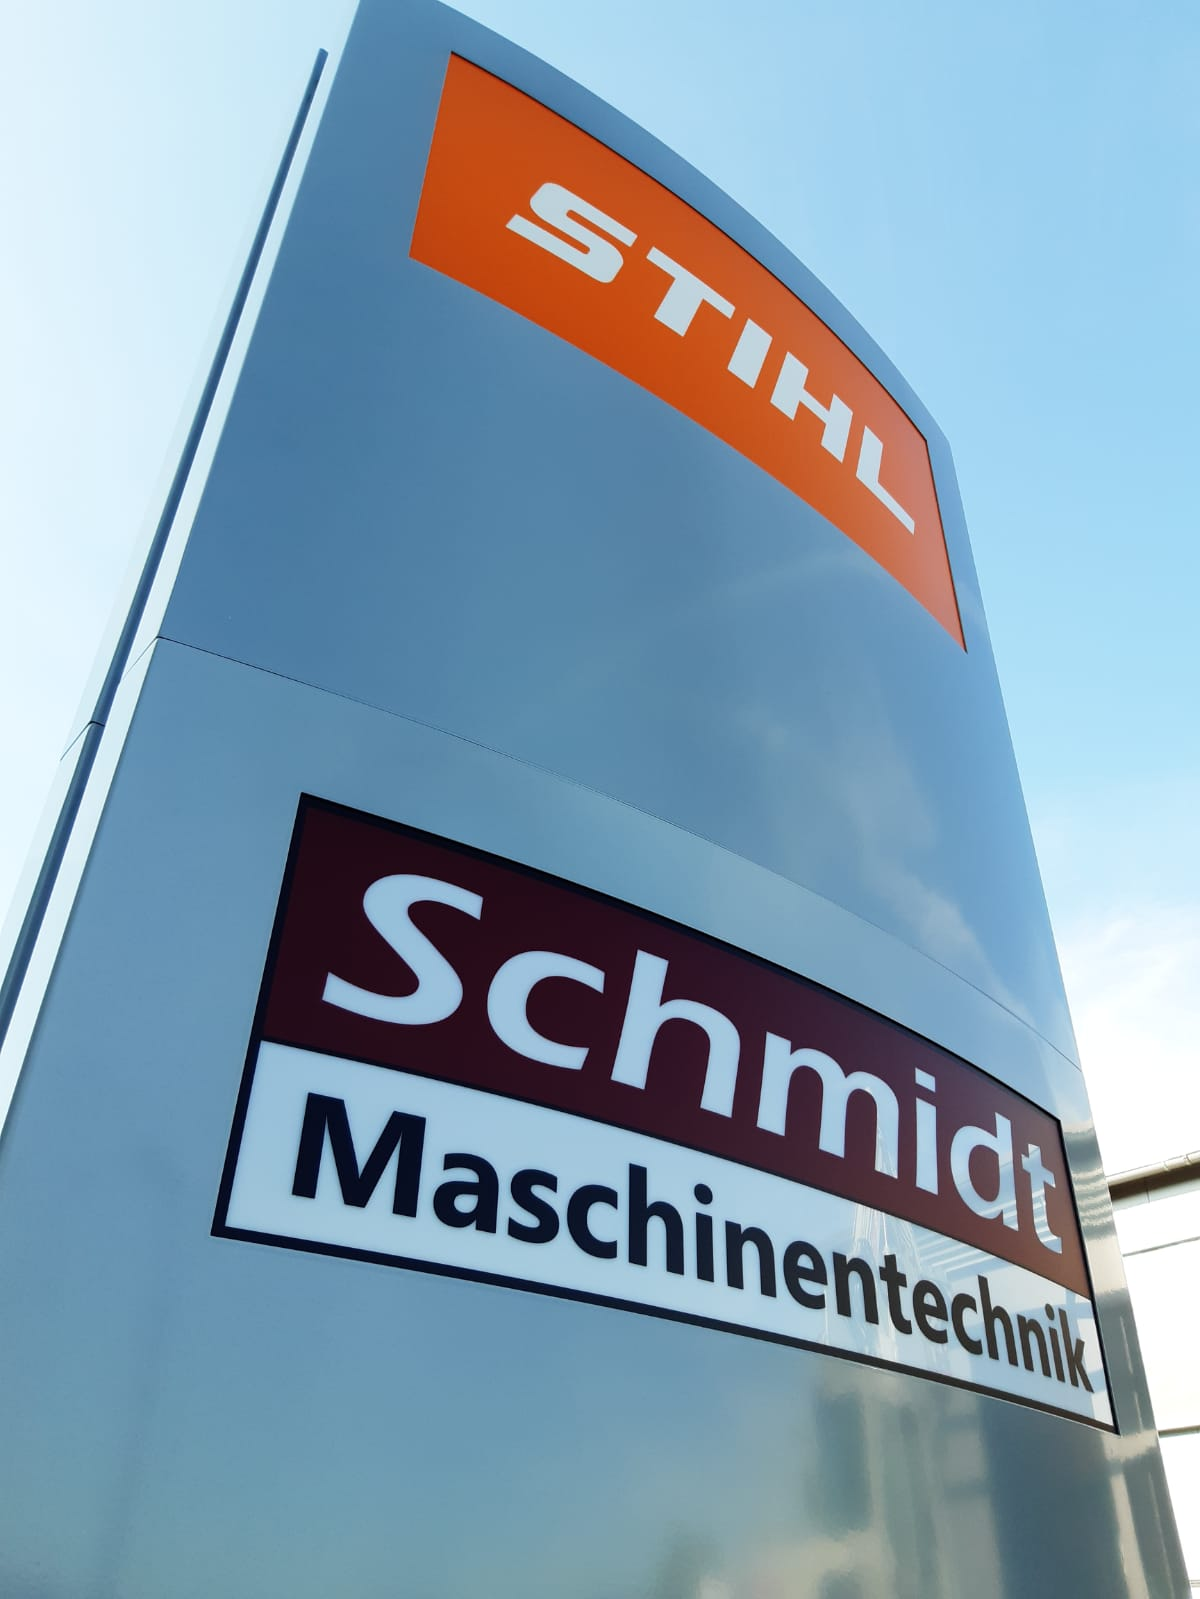 STIHL_Schmidt-Maschinentechnik_Pylon